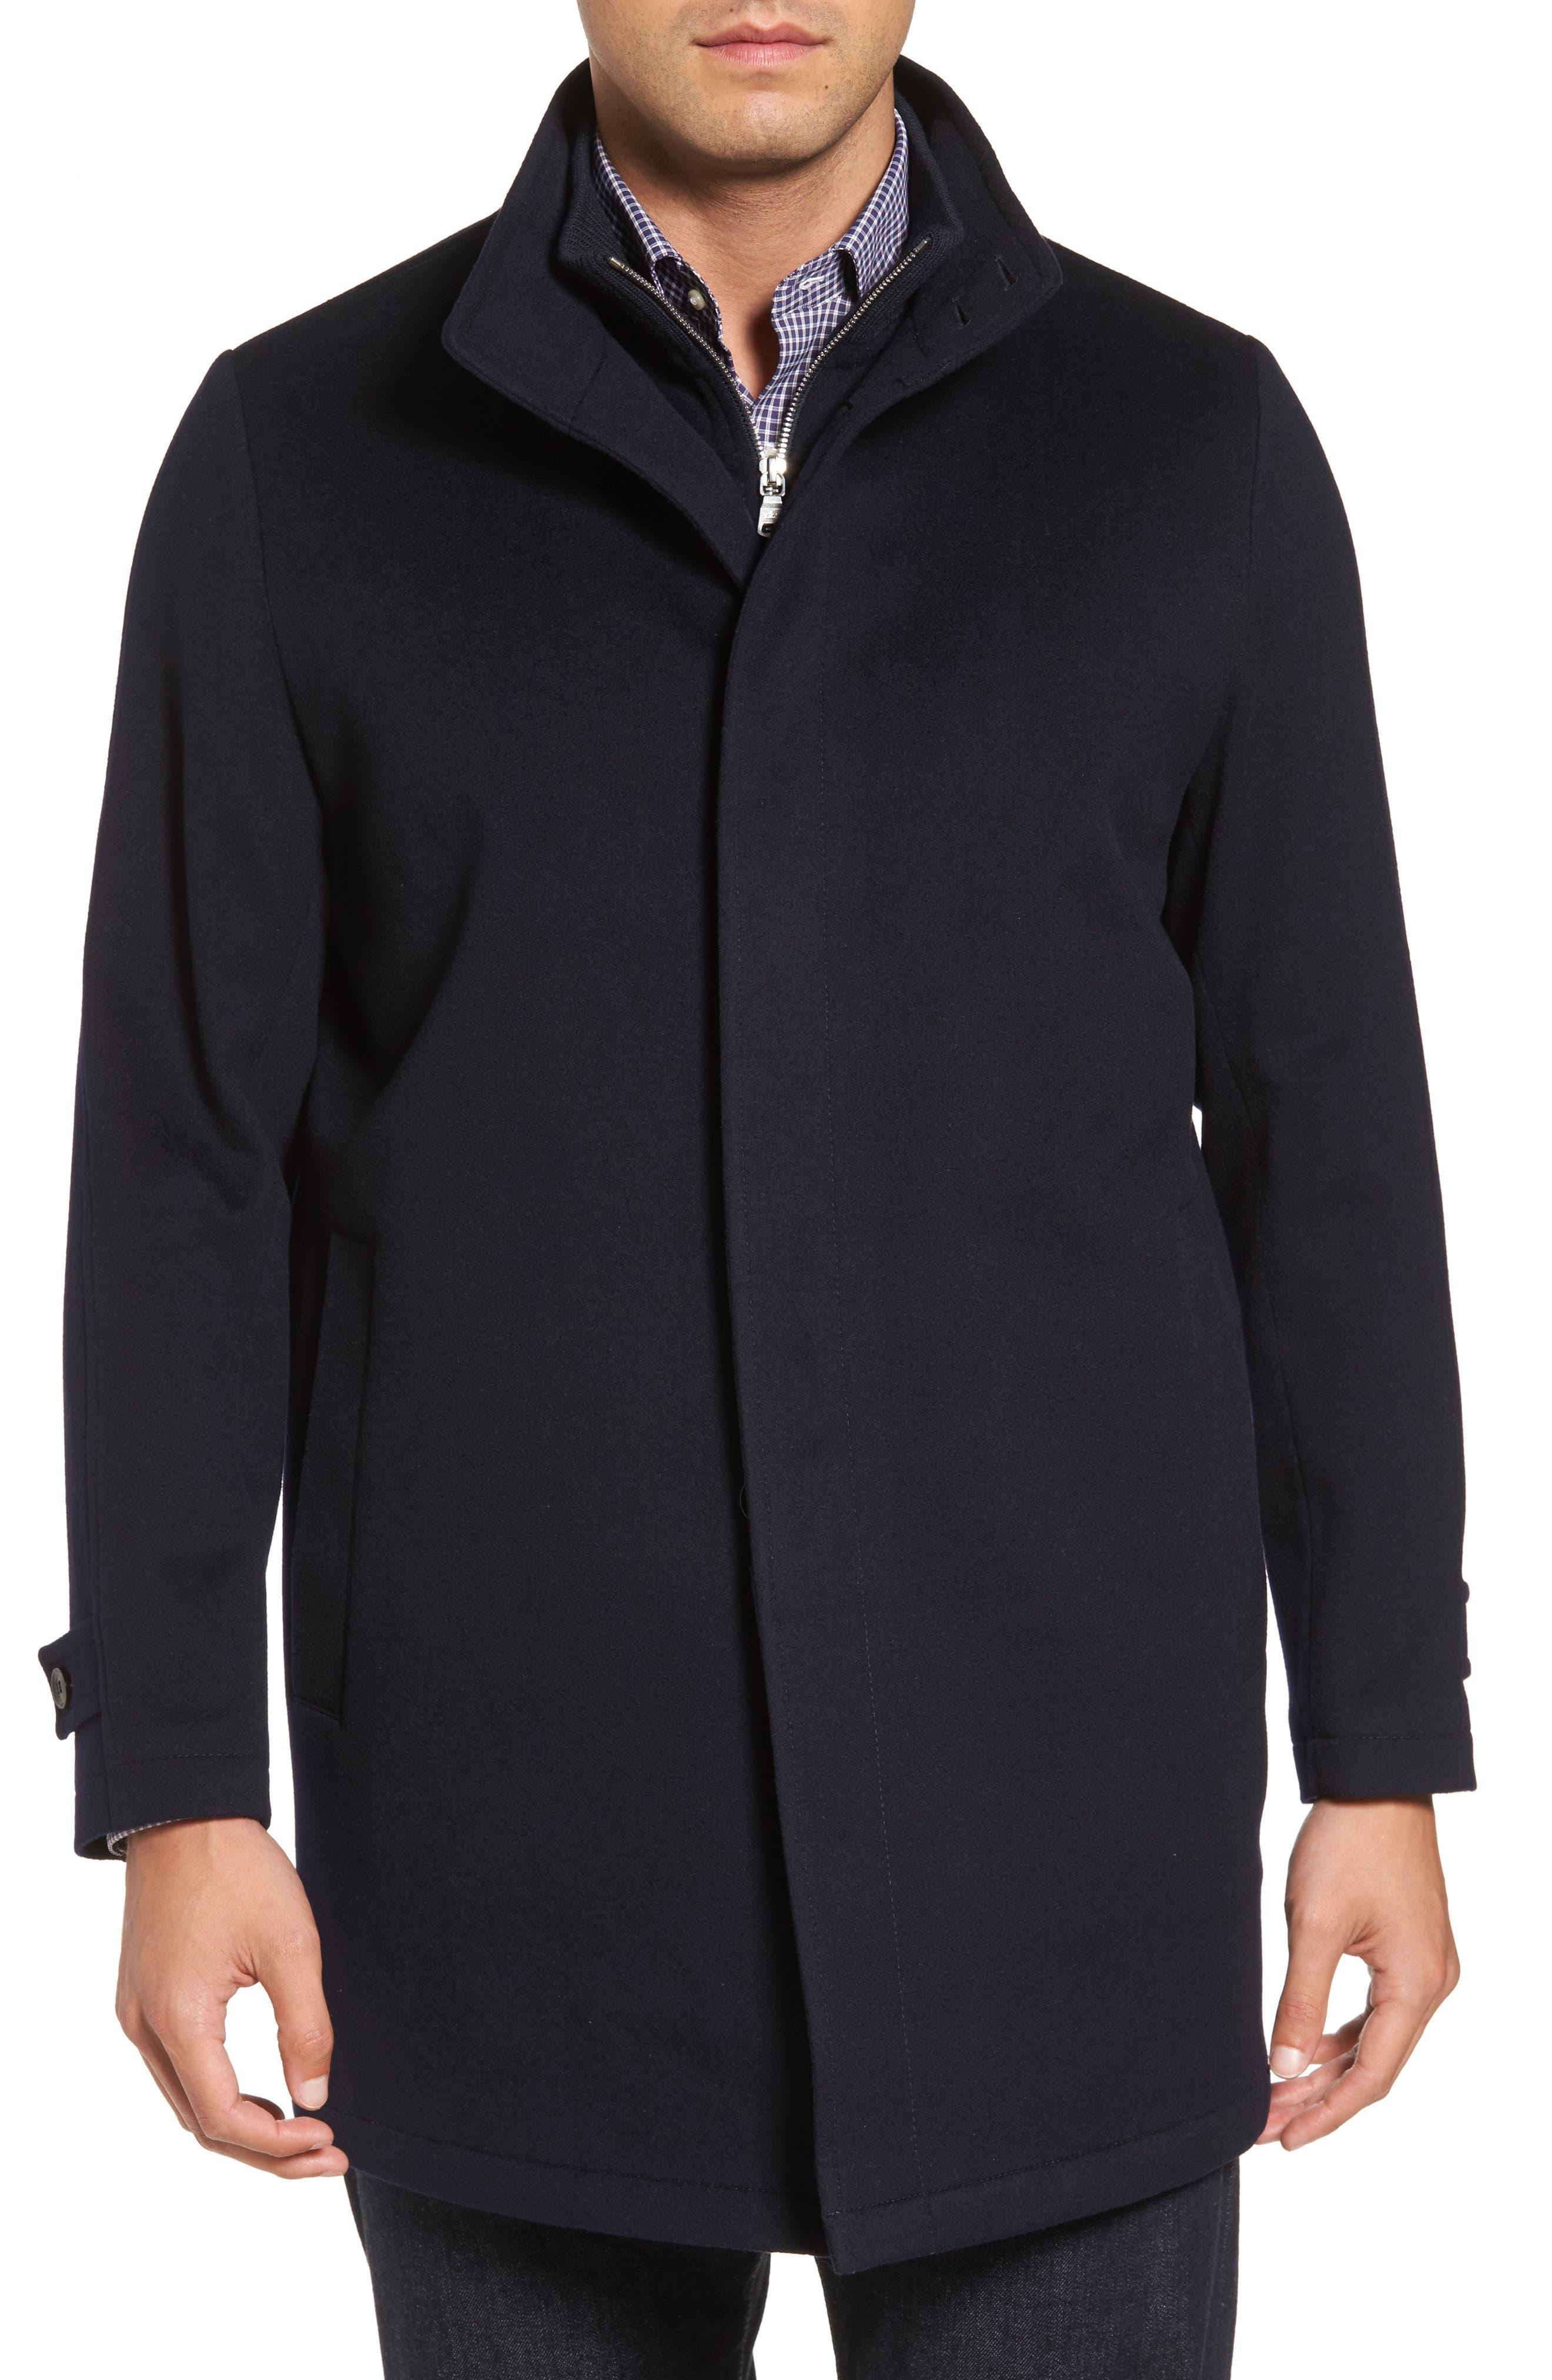 Peter Millar Horizon Wool Overcoat,                             Alternate thumbnail 4, color,                             001